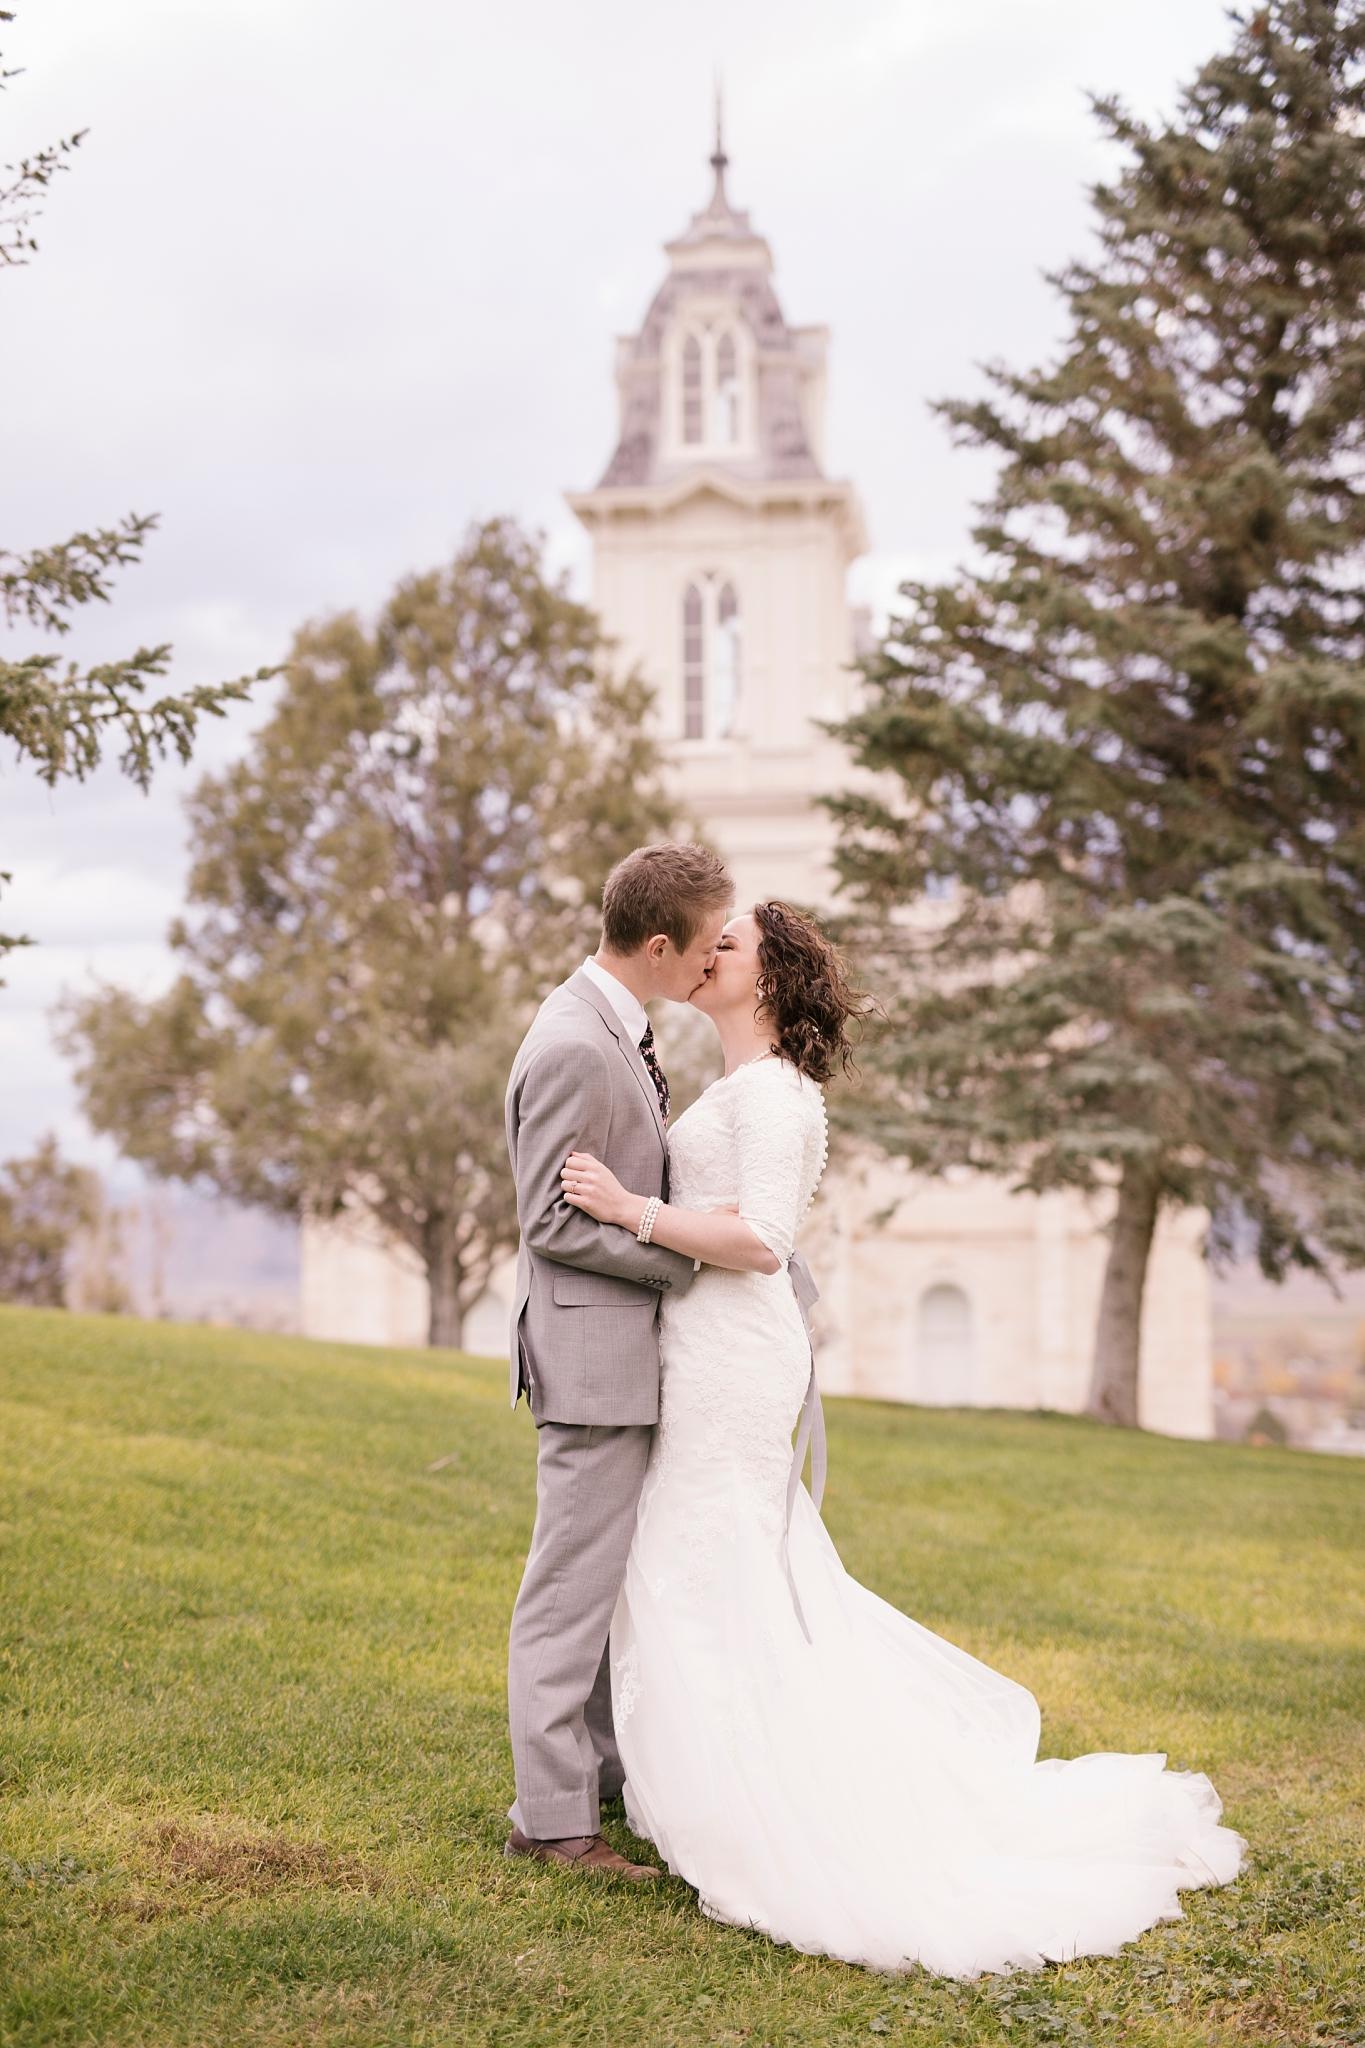 BA-Bridals-106_Lizzie-B-Imagery-Utah-Wedding-Photographer-Engagement-Photography-Salt-Lake-City-Park-City-Utah-County-Manti-Utah-Temple.jpg